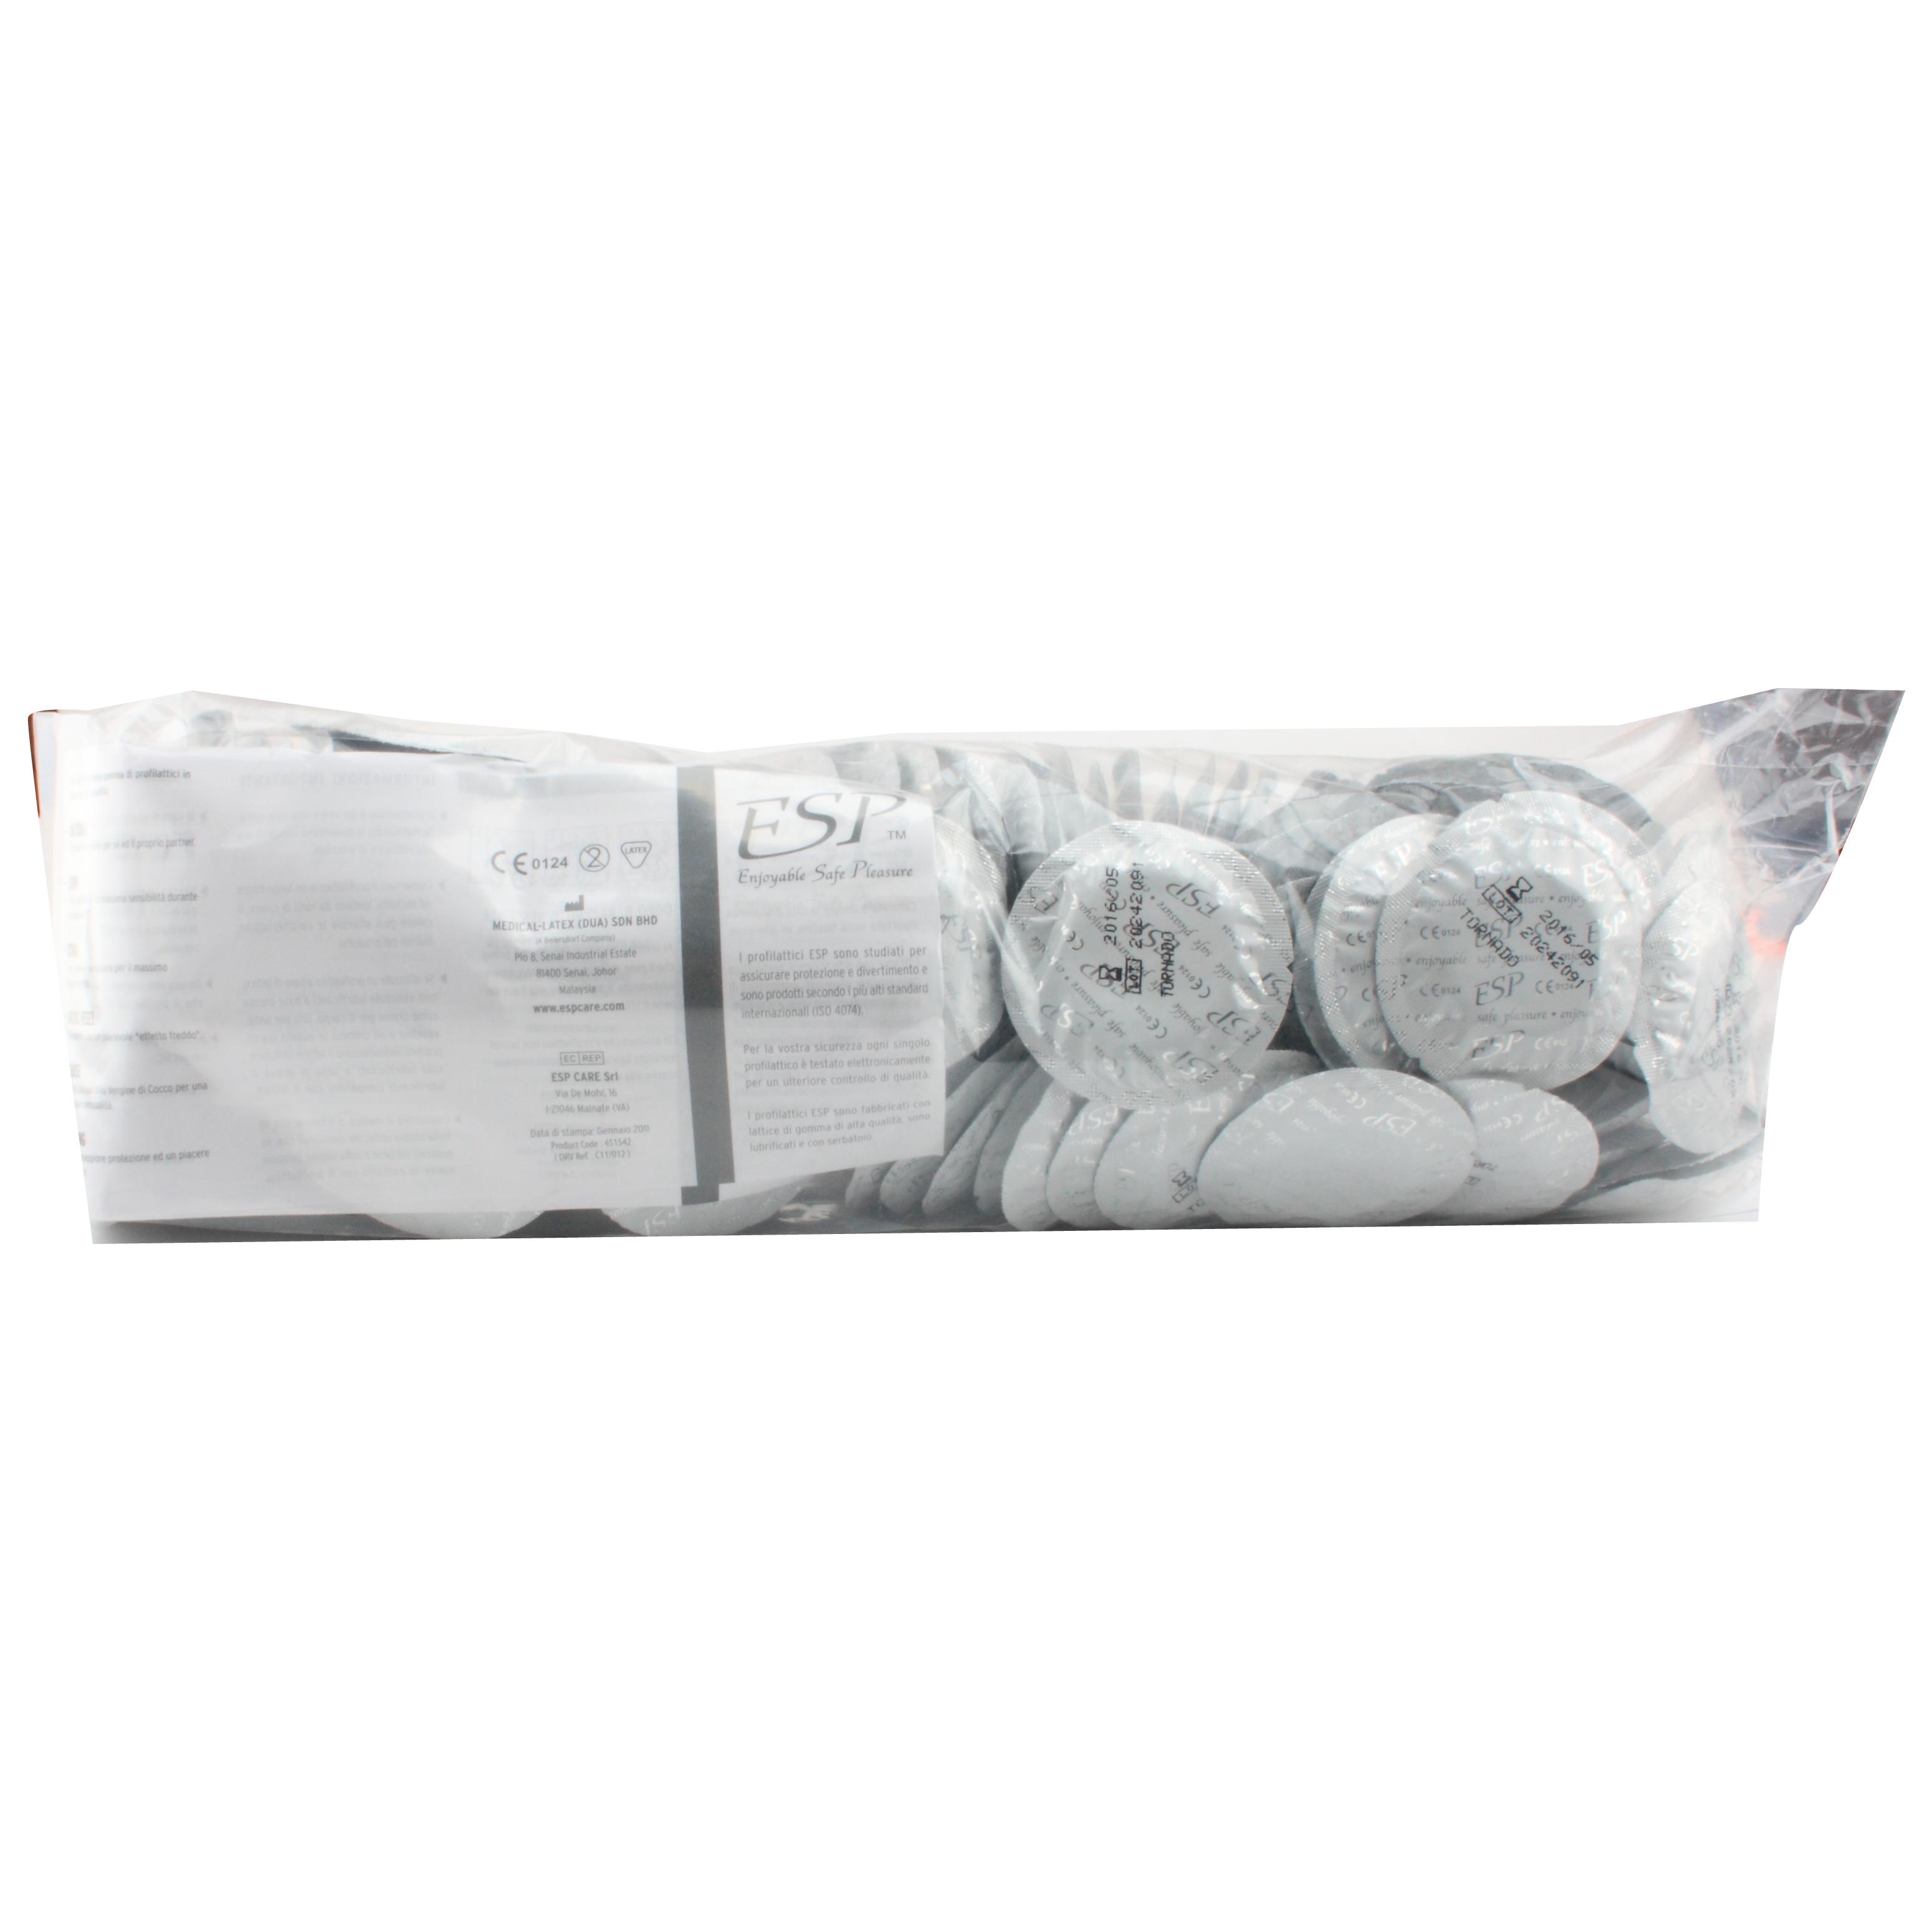 Esp esp tornado - 144 pezzi - preservativi stimolanti